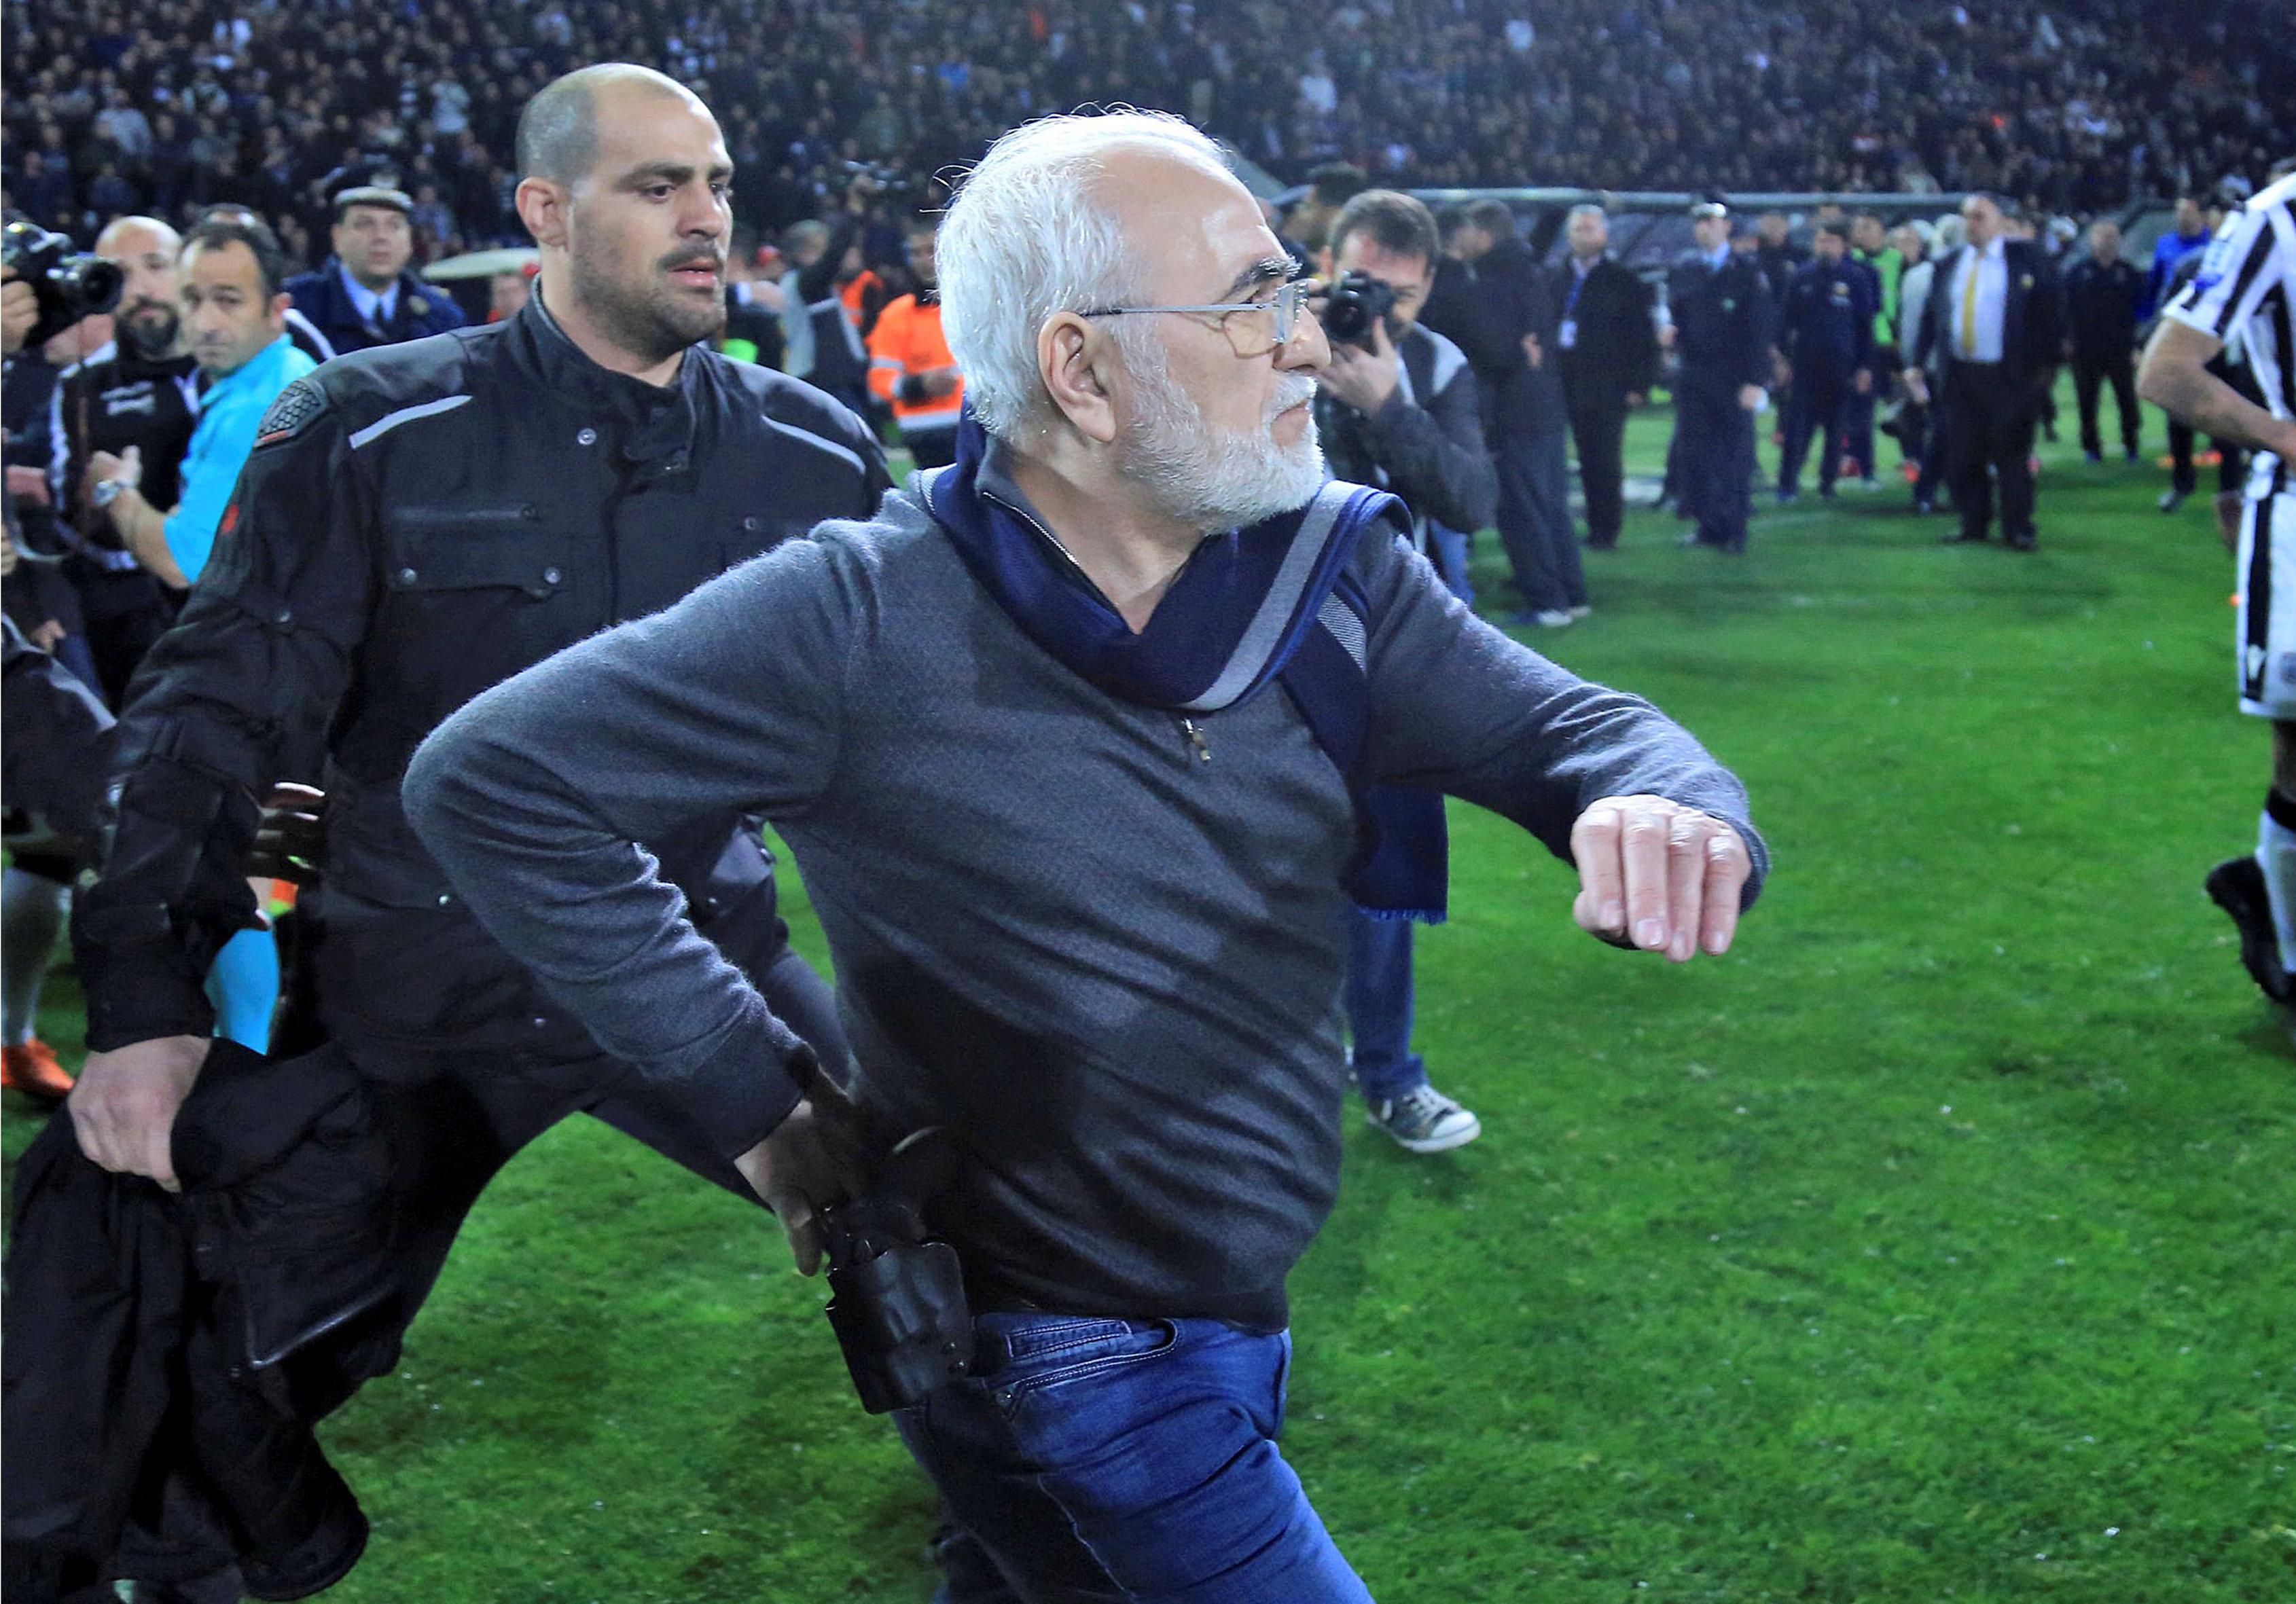 Gun-carrying PAOK boss faces sanctions as FIFA warns Greece